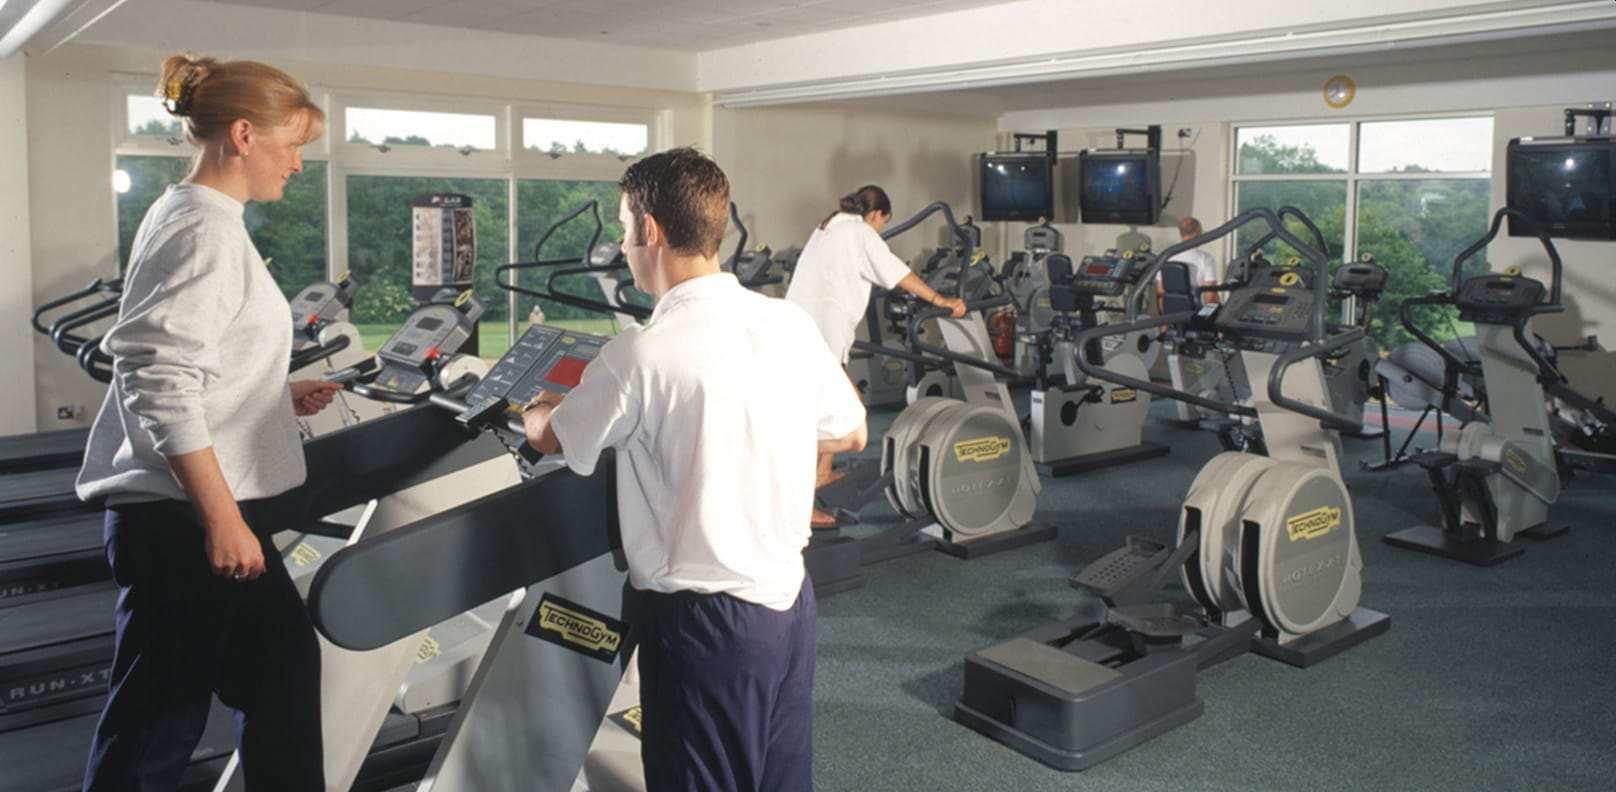 Original Peake Fitness Technogym 1999